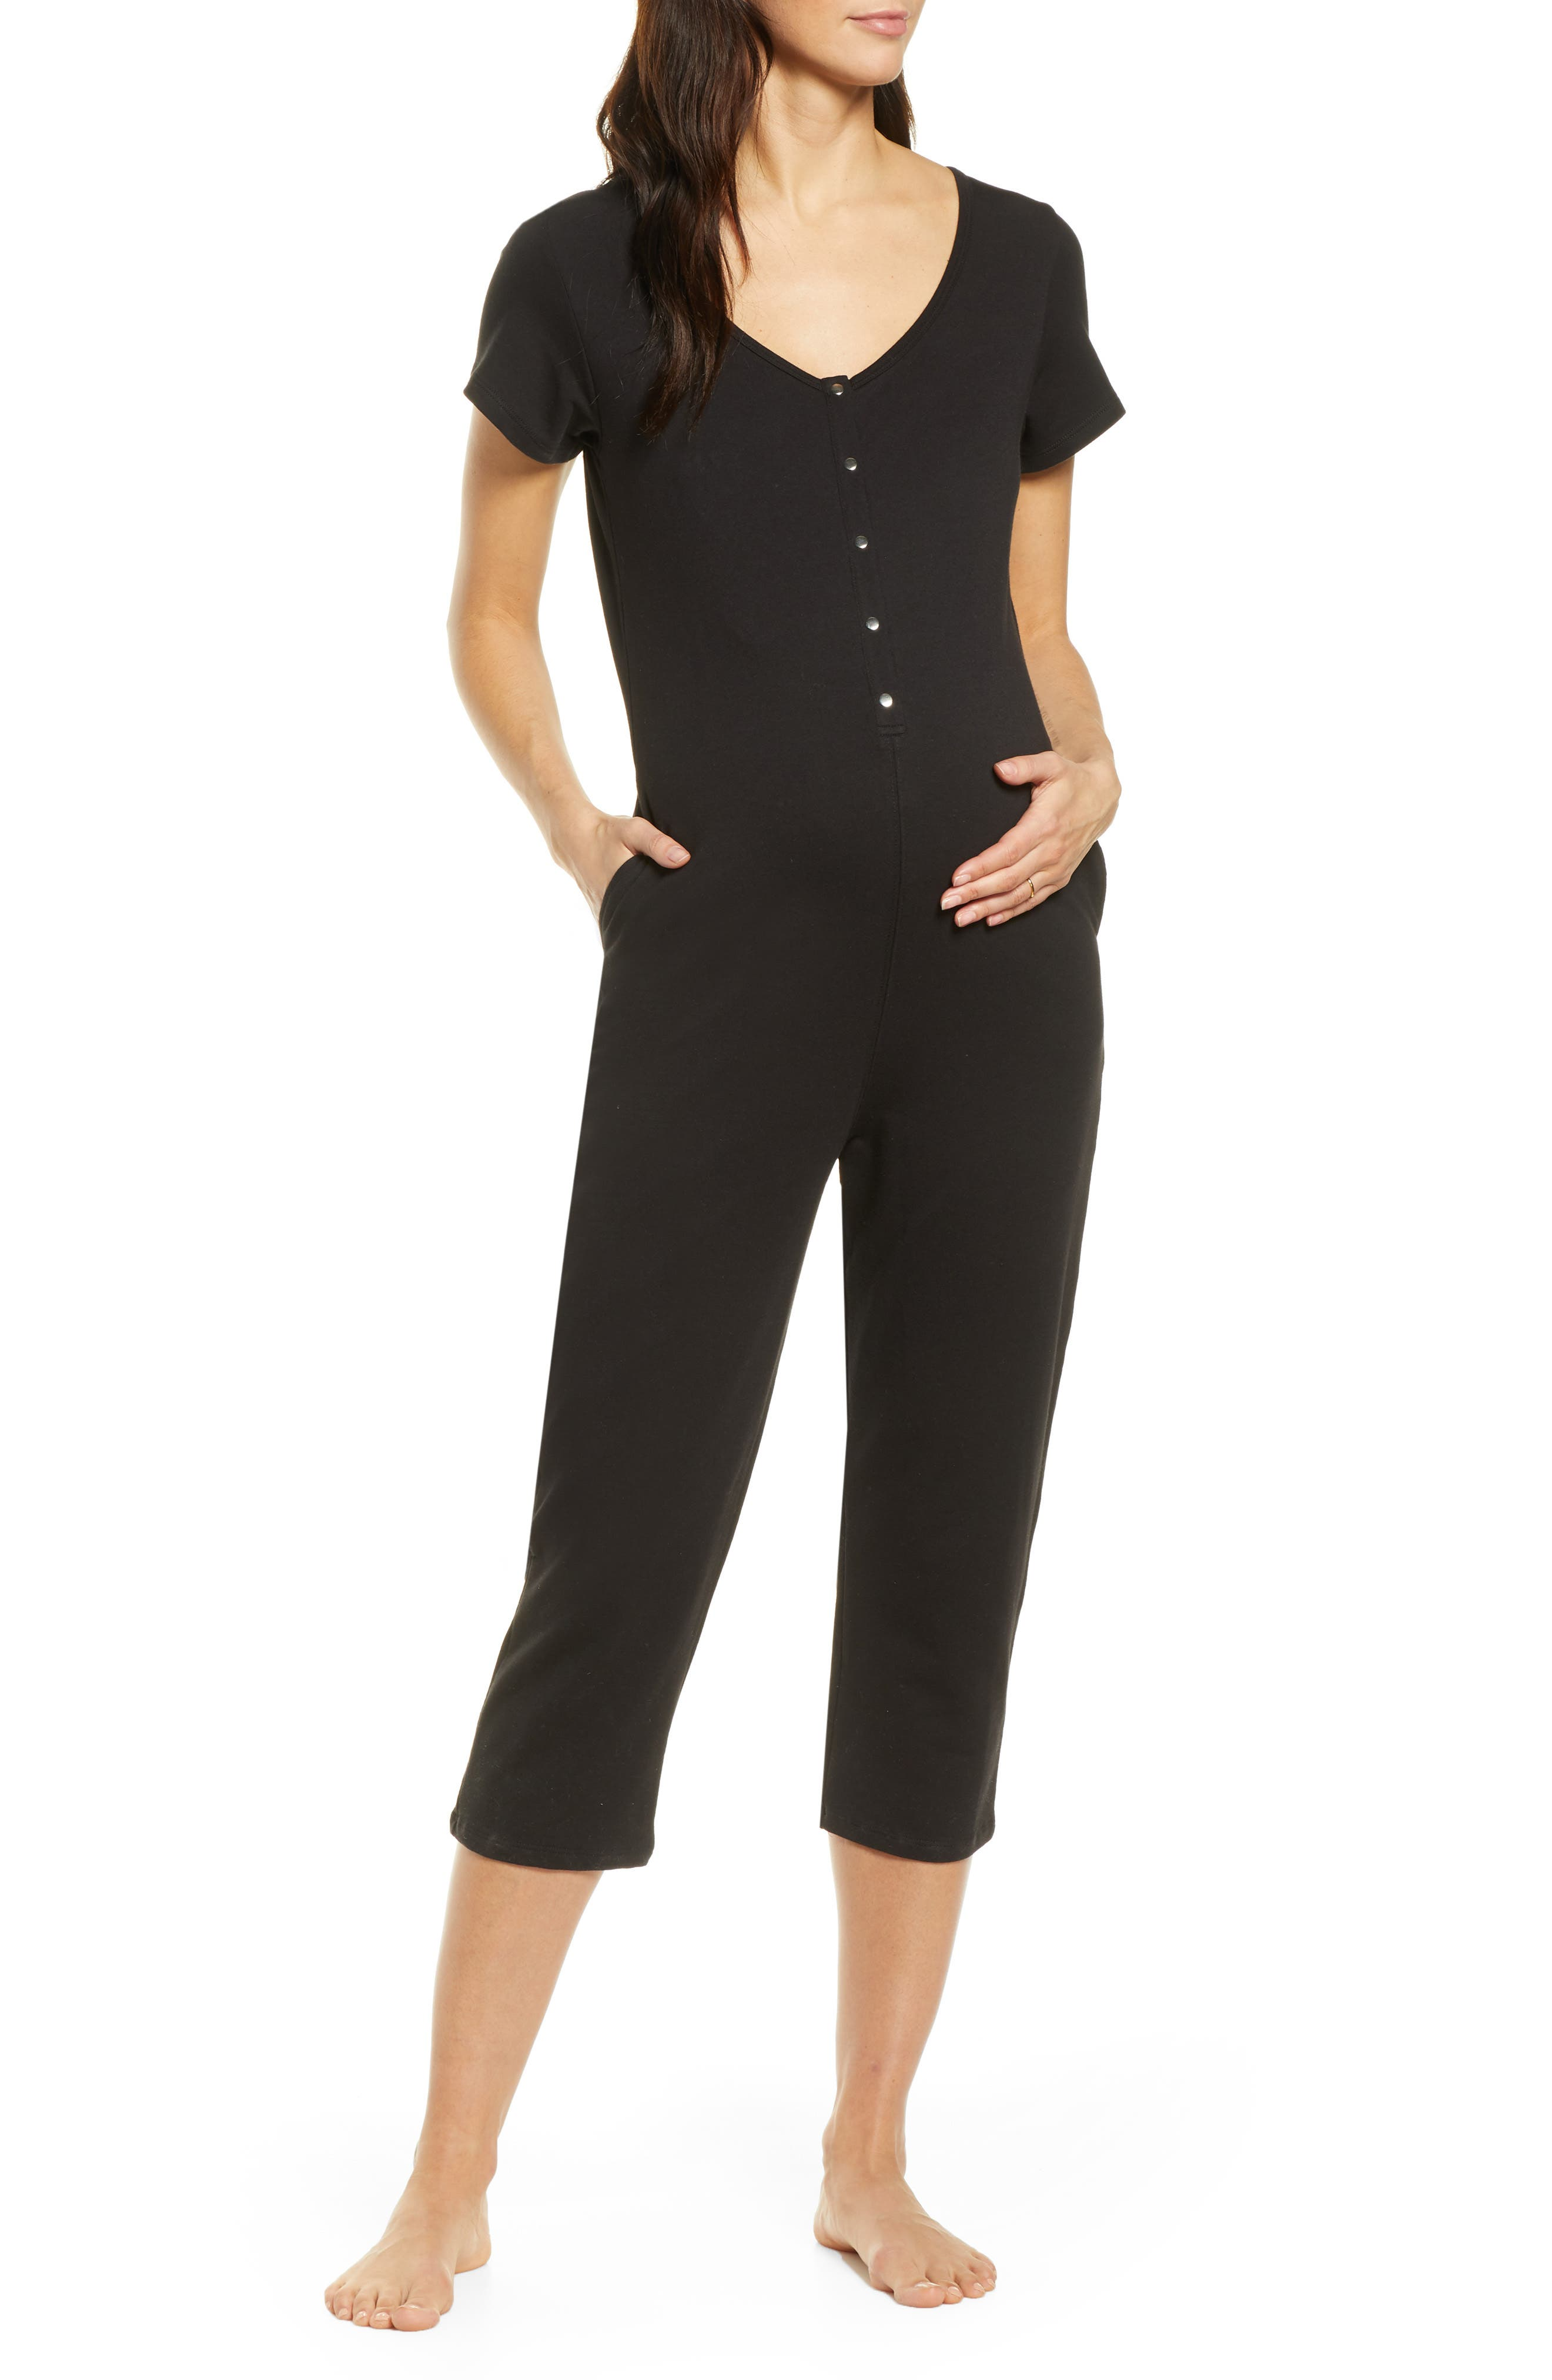 Short Sleeve Nursing/maternity Romper